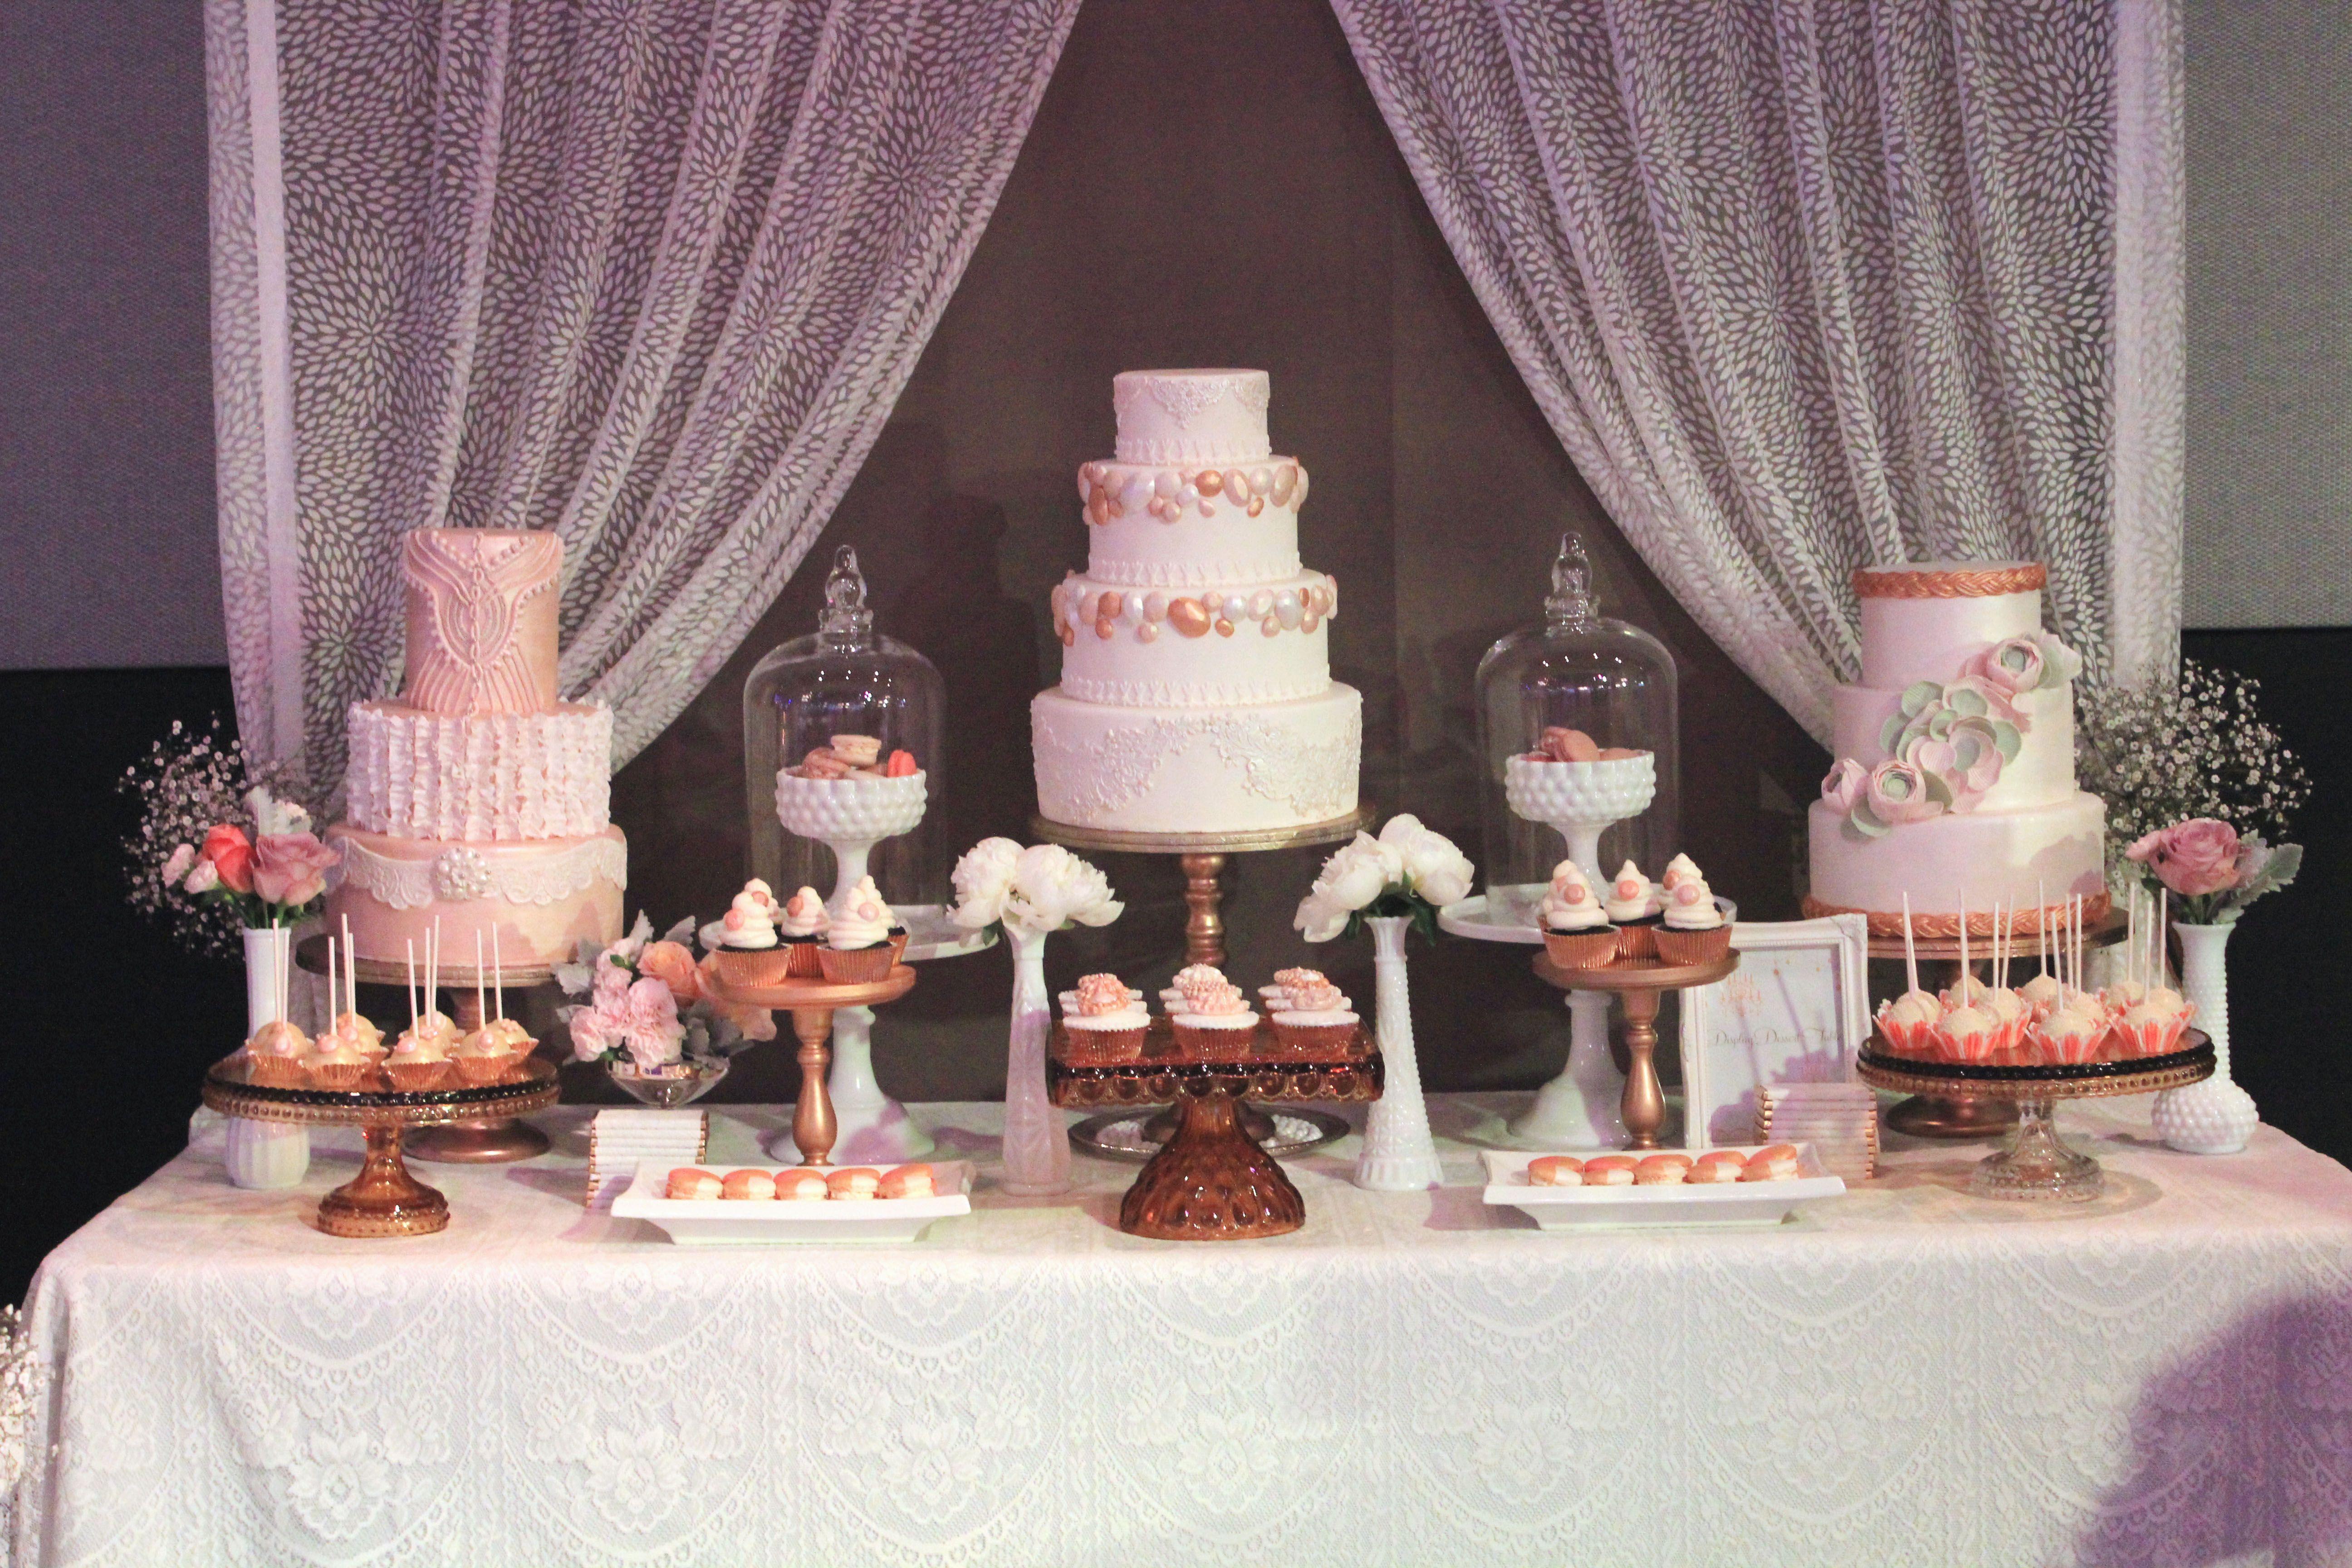 Doltone house bridal expo my little jedi u sweet bloom cakes